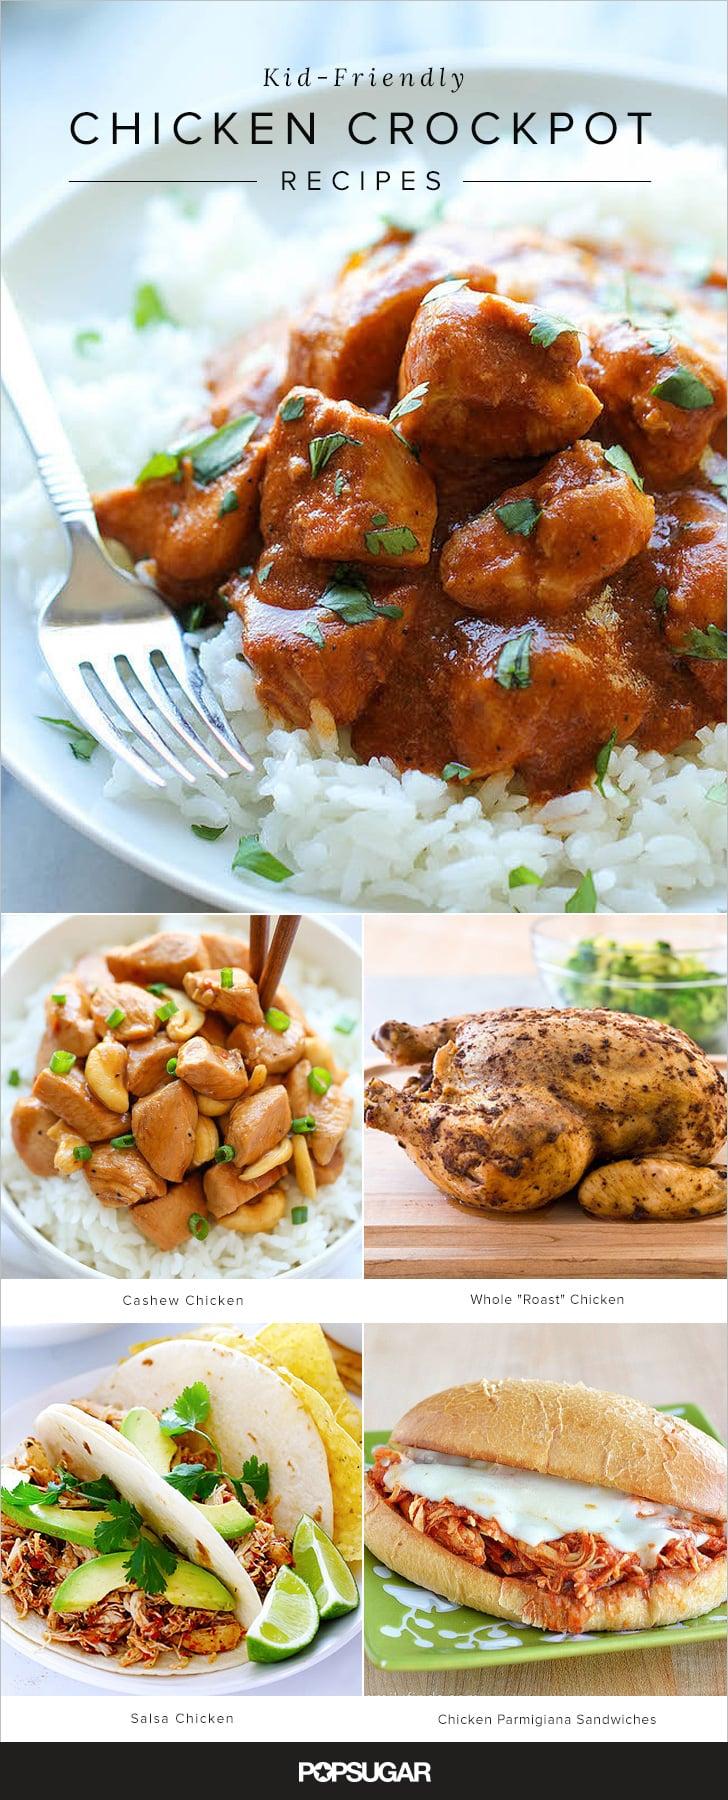 Kid-Friendly Crock Pot Chicken Recipes